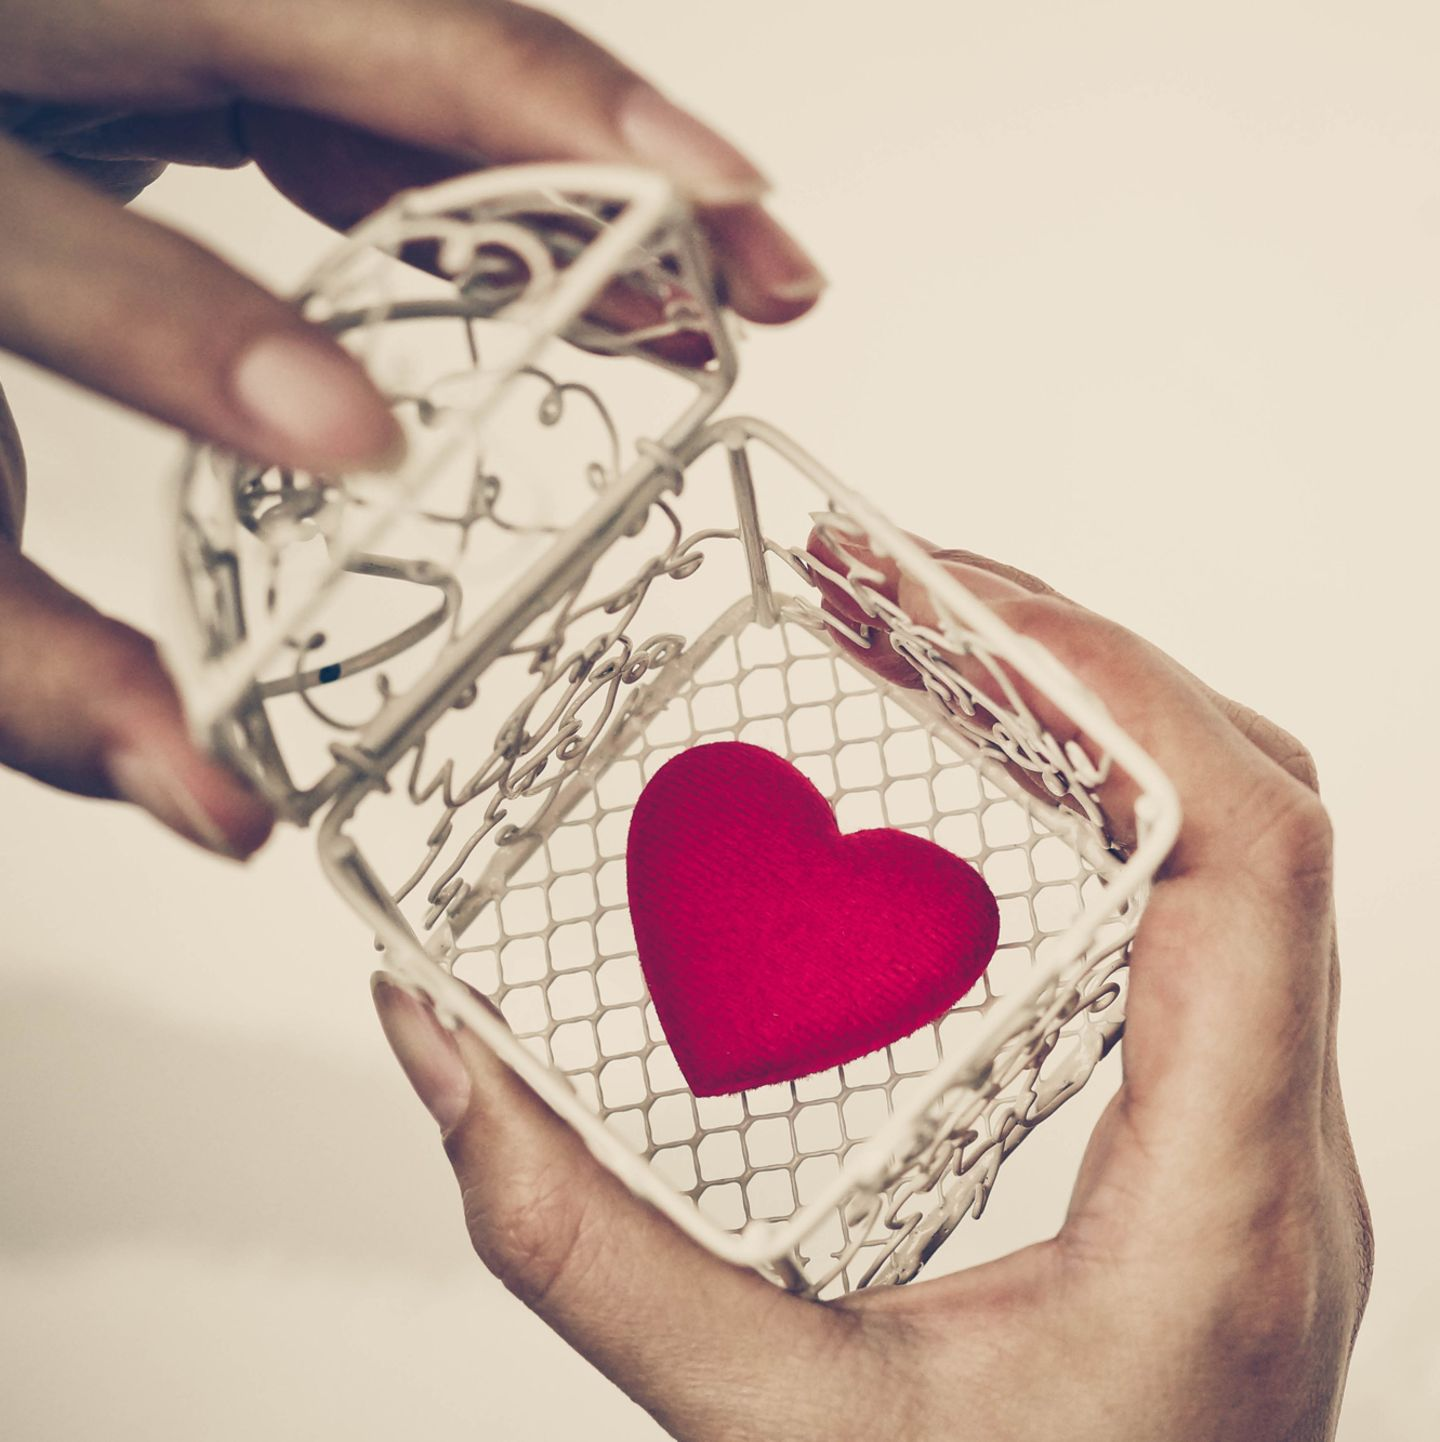 Kontaktanzeigen Hart bei Wildon | Locanto Dating Hart bei